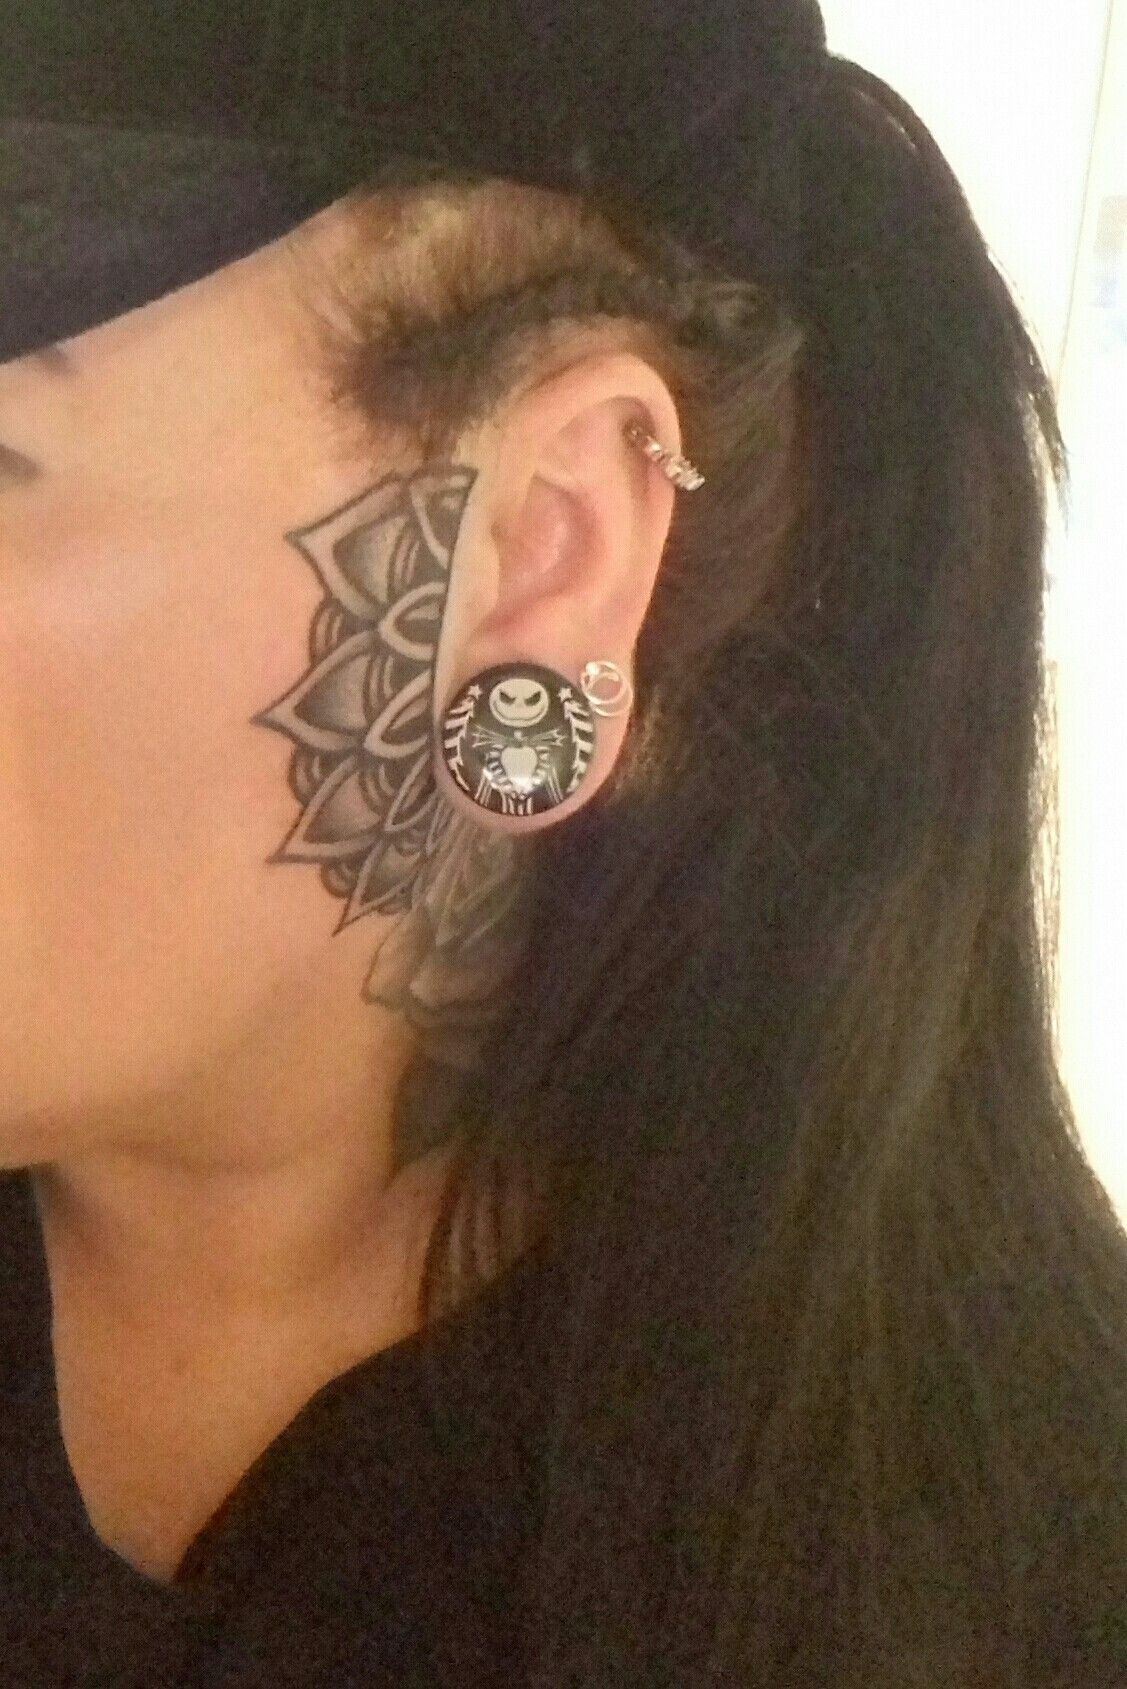 New piercing ideas  New mandala tattoo  art  Pinterest  Tattoo and Piercings